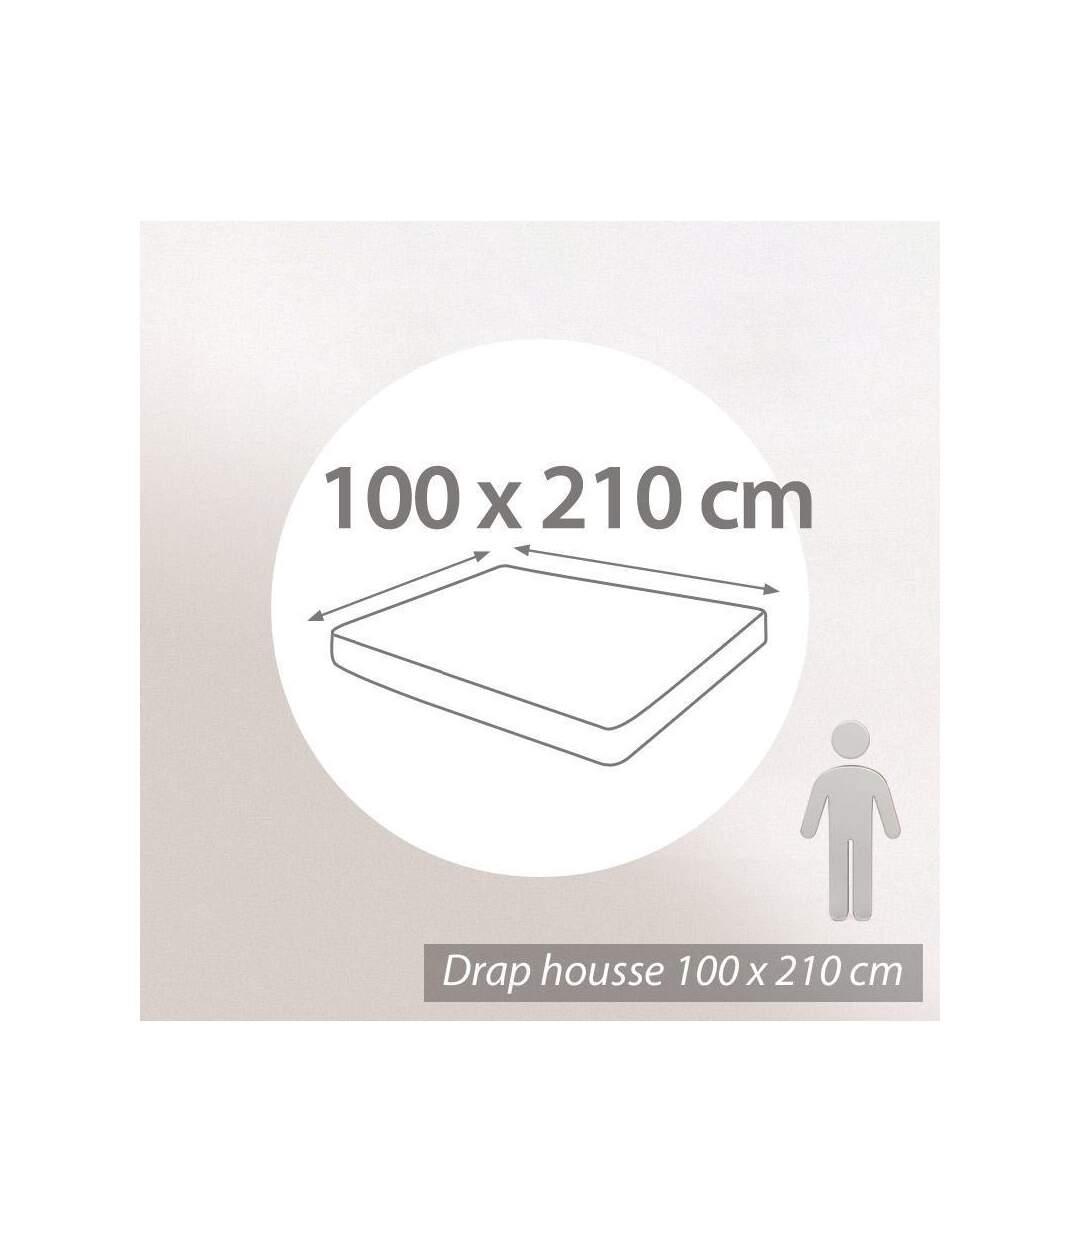 Protège matelas 100x210 absorbant Antonin